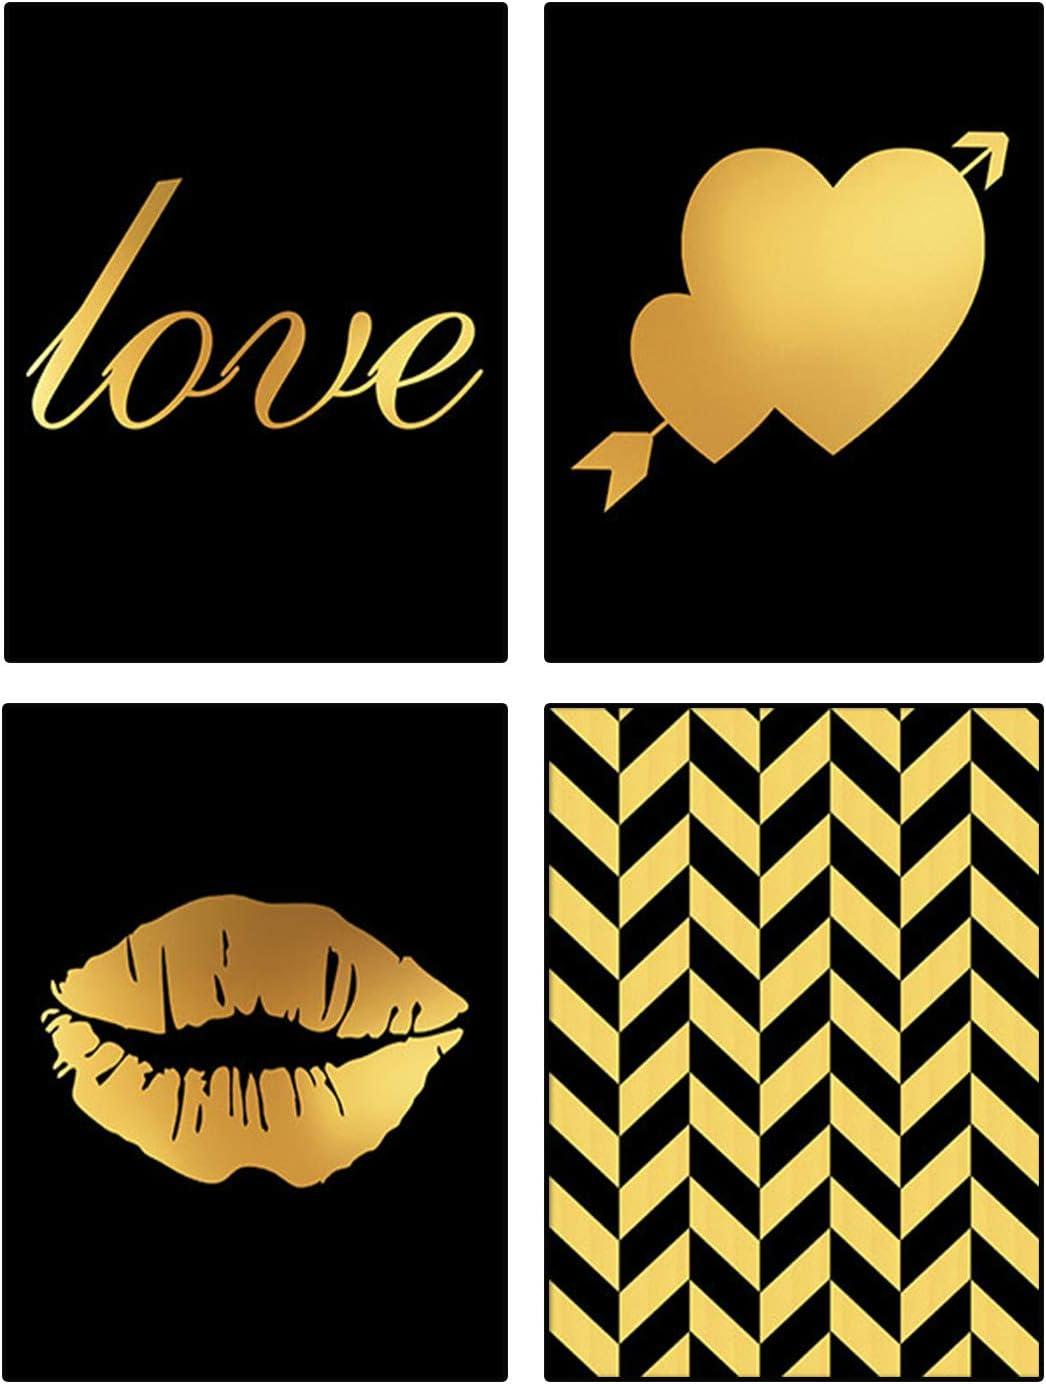 "Modern Minimalist Fashion Women Black Gold Bronzing Lips Love Stripe Posters Painting Set of 4 (8""X10'' Canvas Picture) Woman Girl Room Decor Bathroom Spa Room Art Prints Home Decor Unframed"